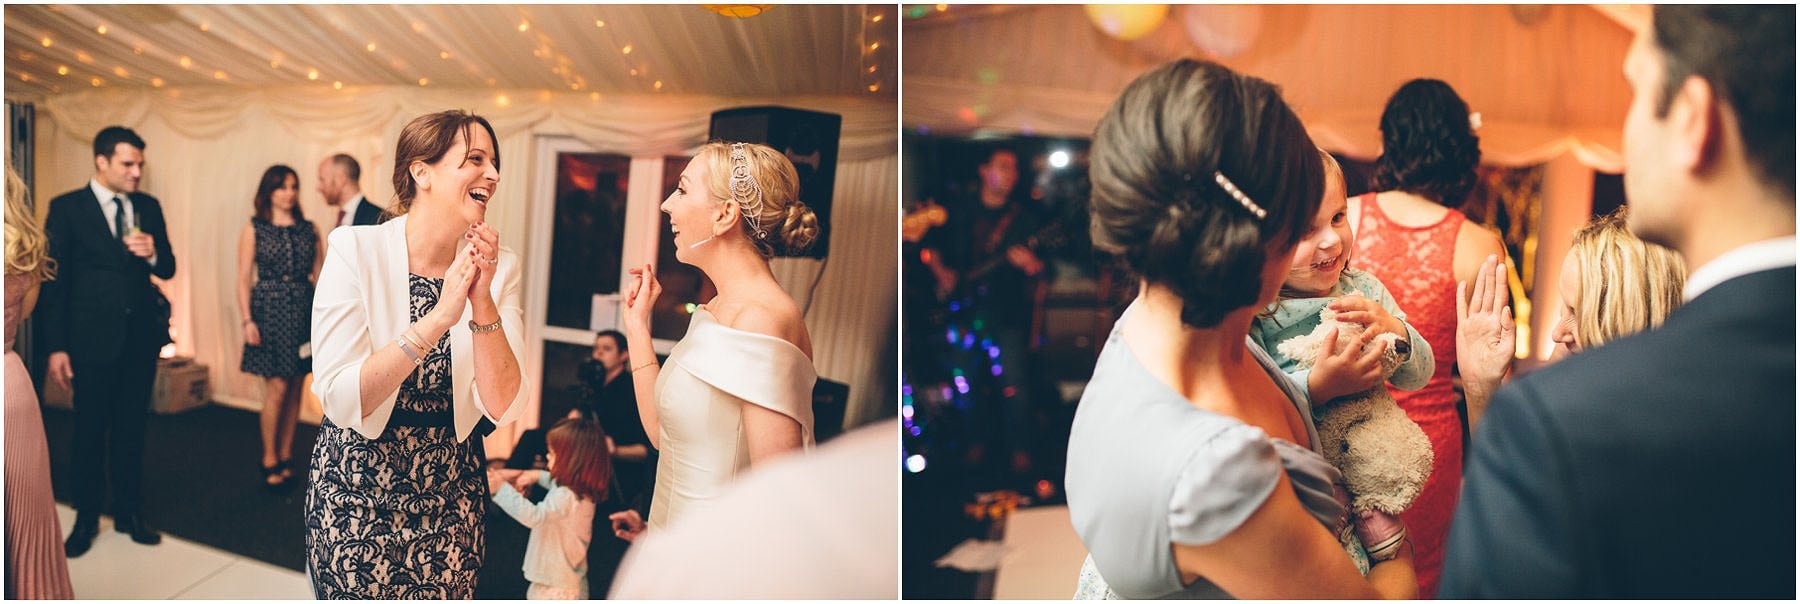 Capesthorne_Hall_Wedding_Photography_0142